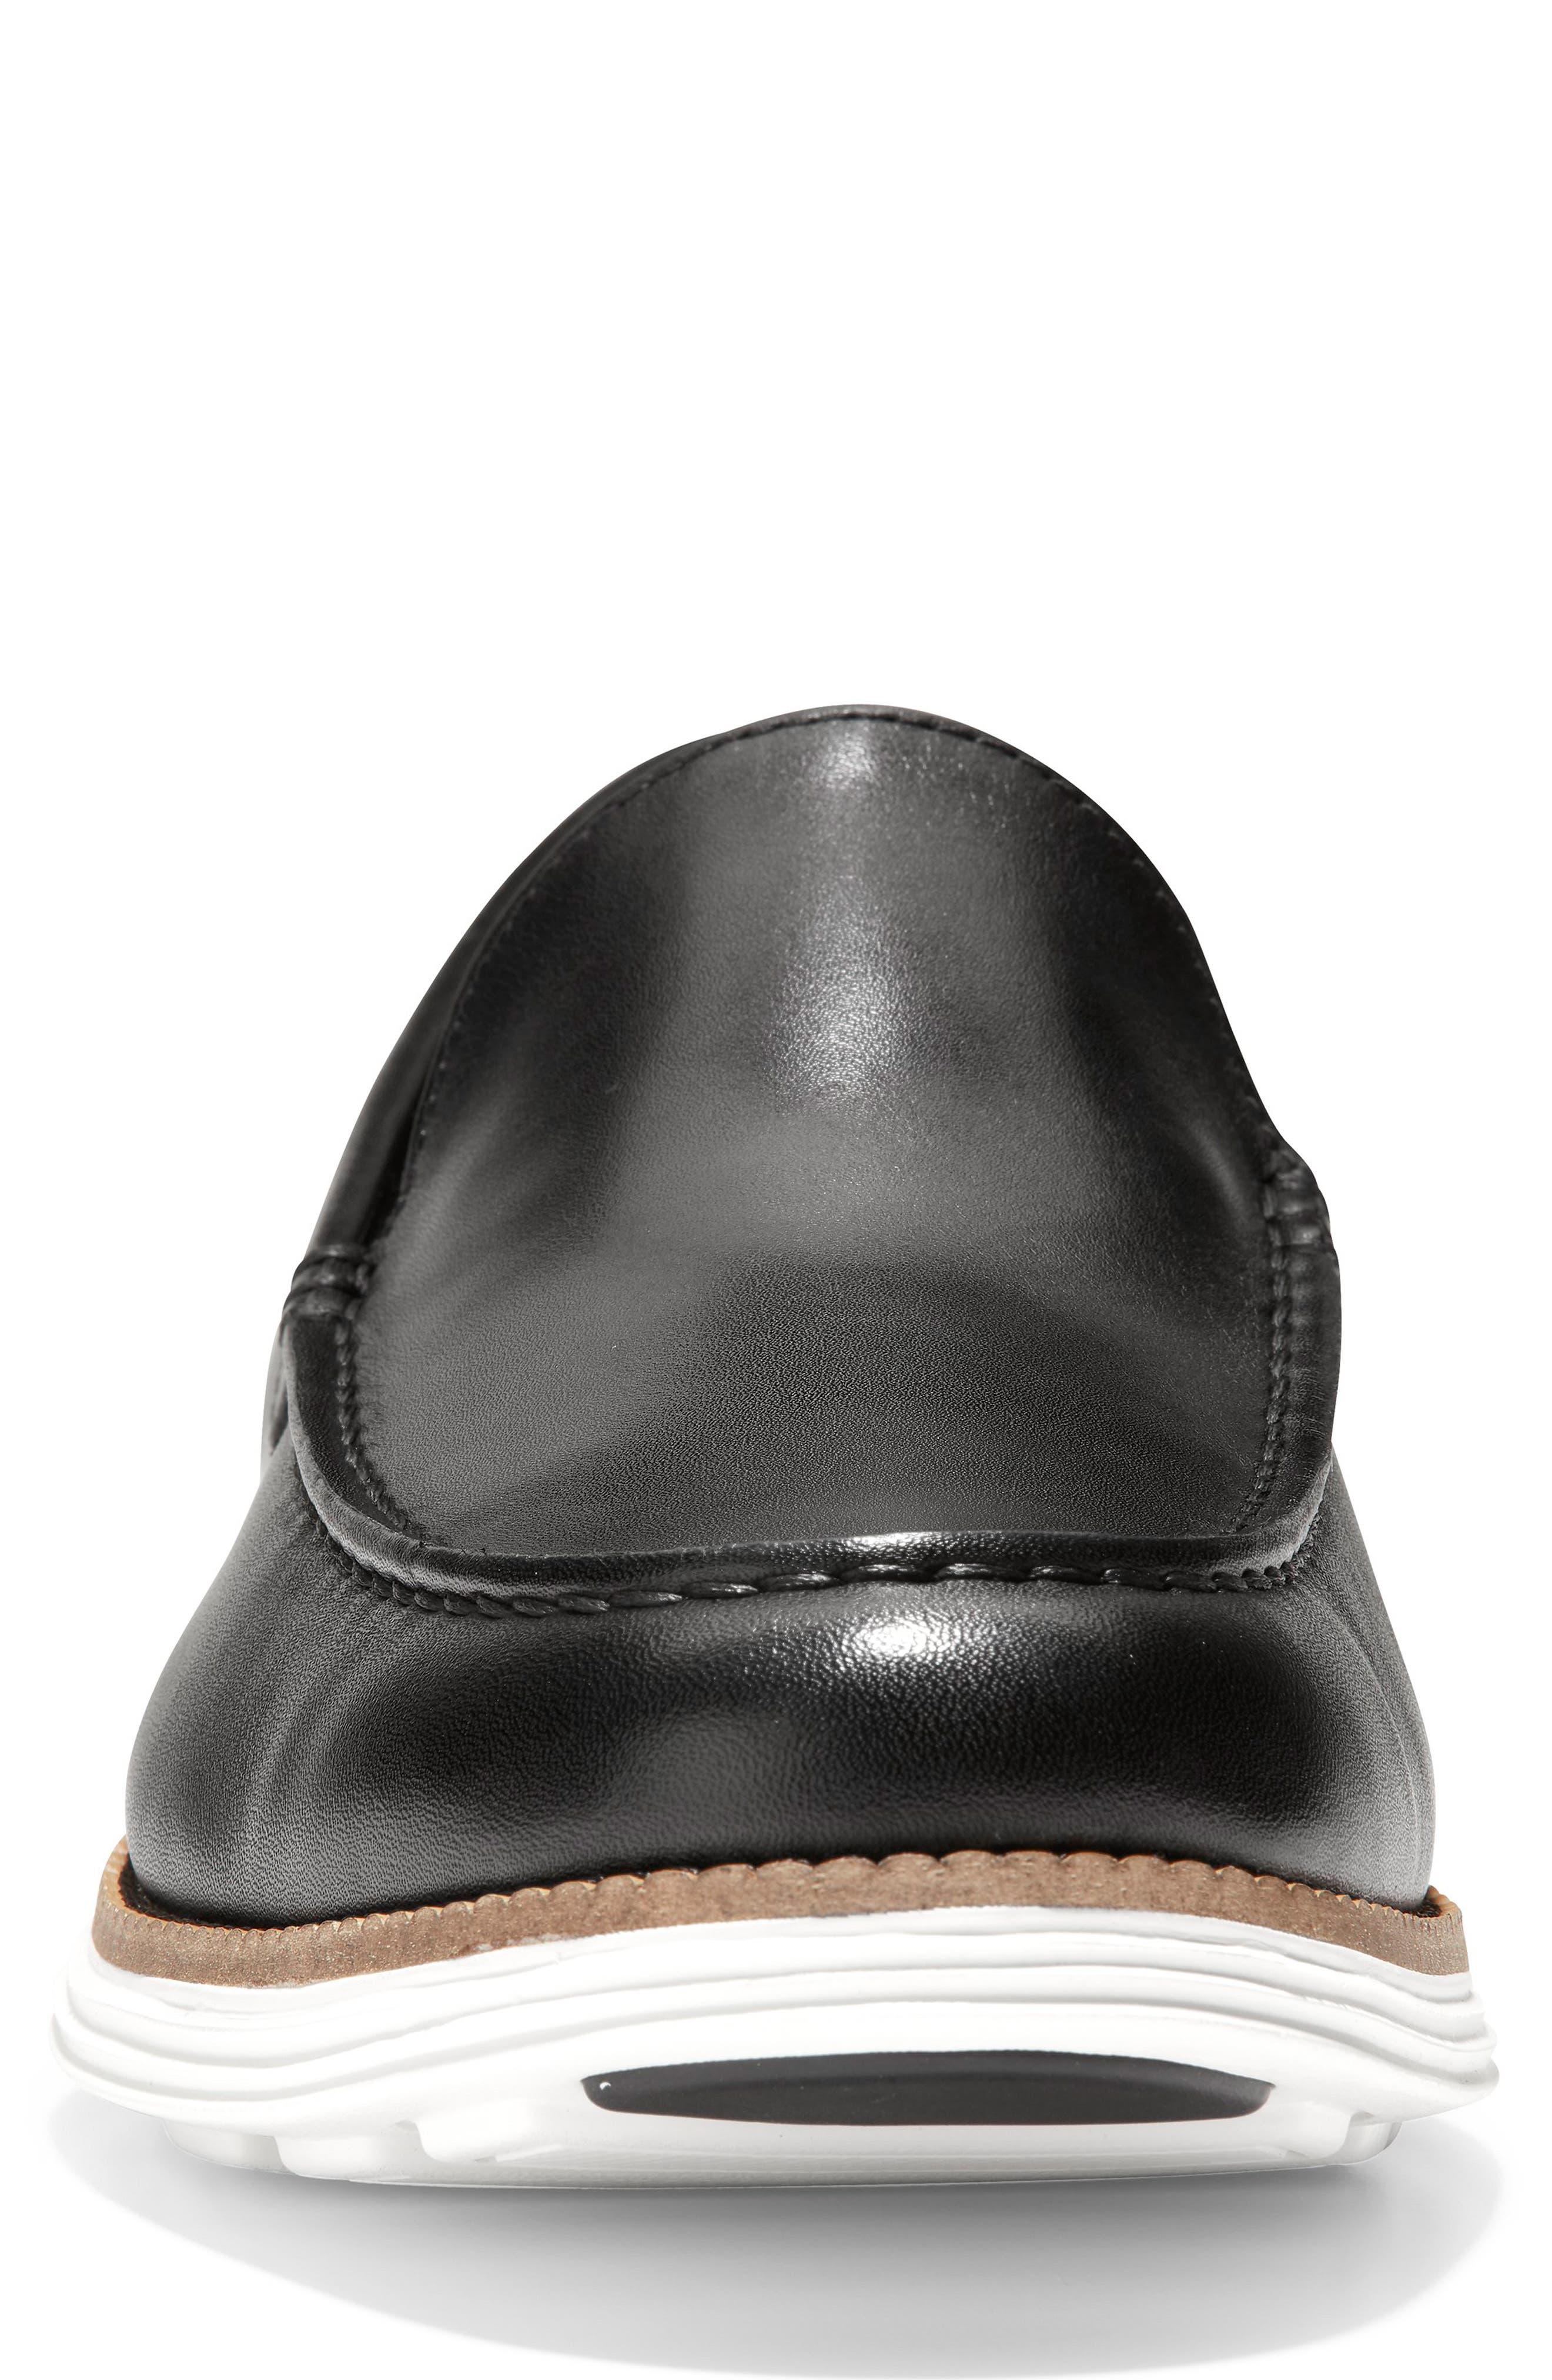 Original Grand Loafer,                             Alternate thumbnail 4, color,                             BLACK/ OPTIC WHITE LEATHER